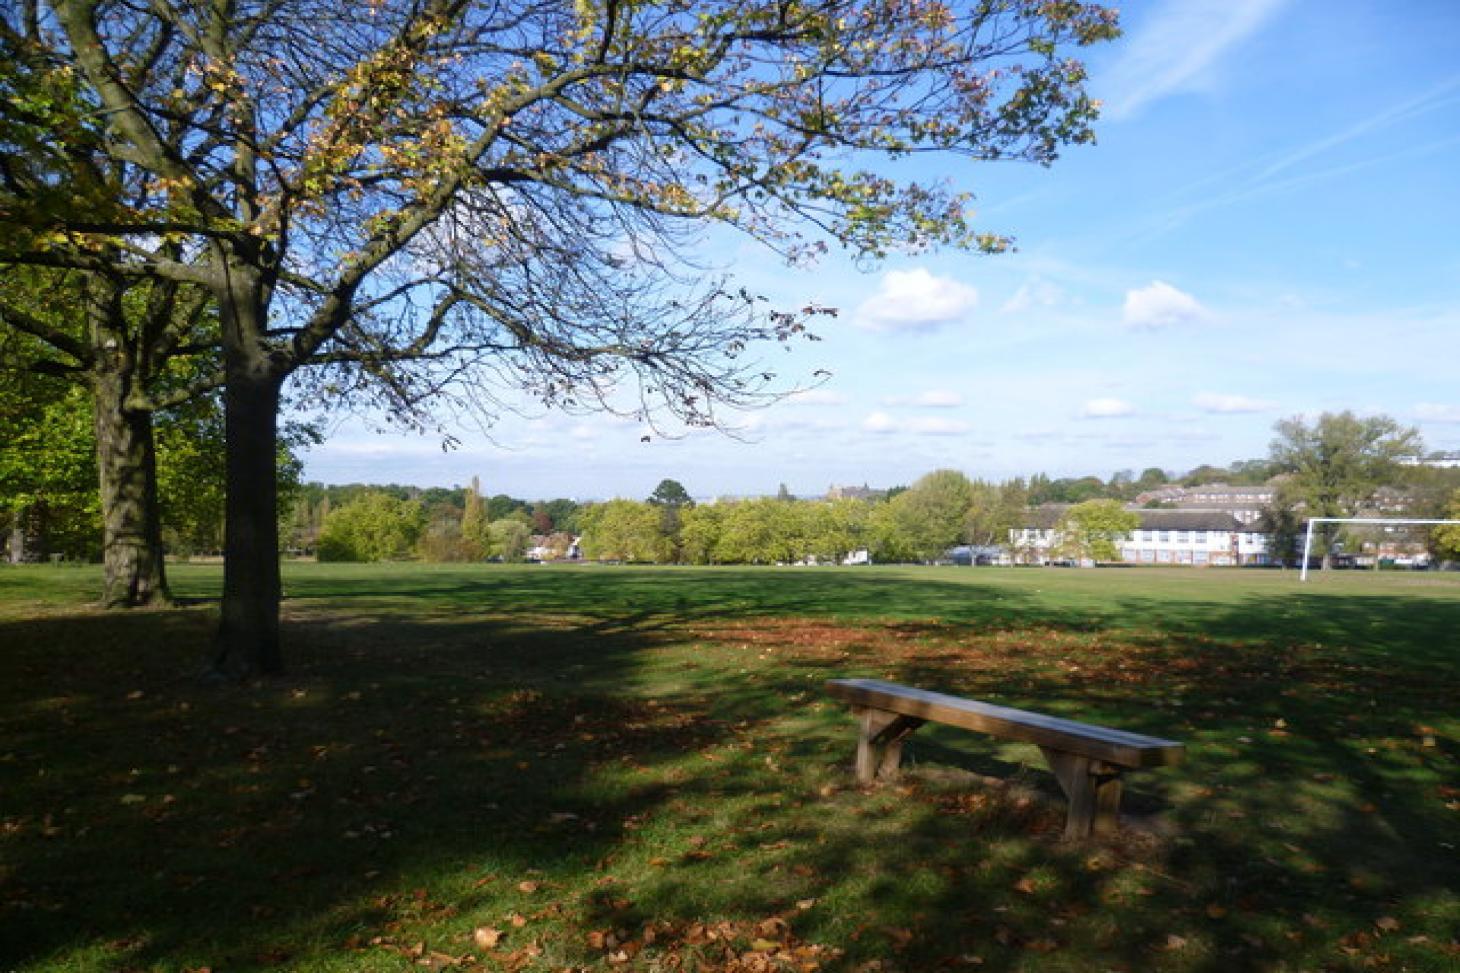 Upper Norwood Recreation Ground Outdoor | Hard (macadam) tennis court